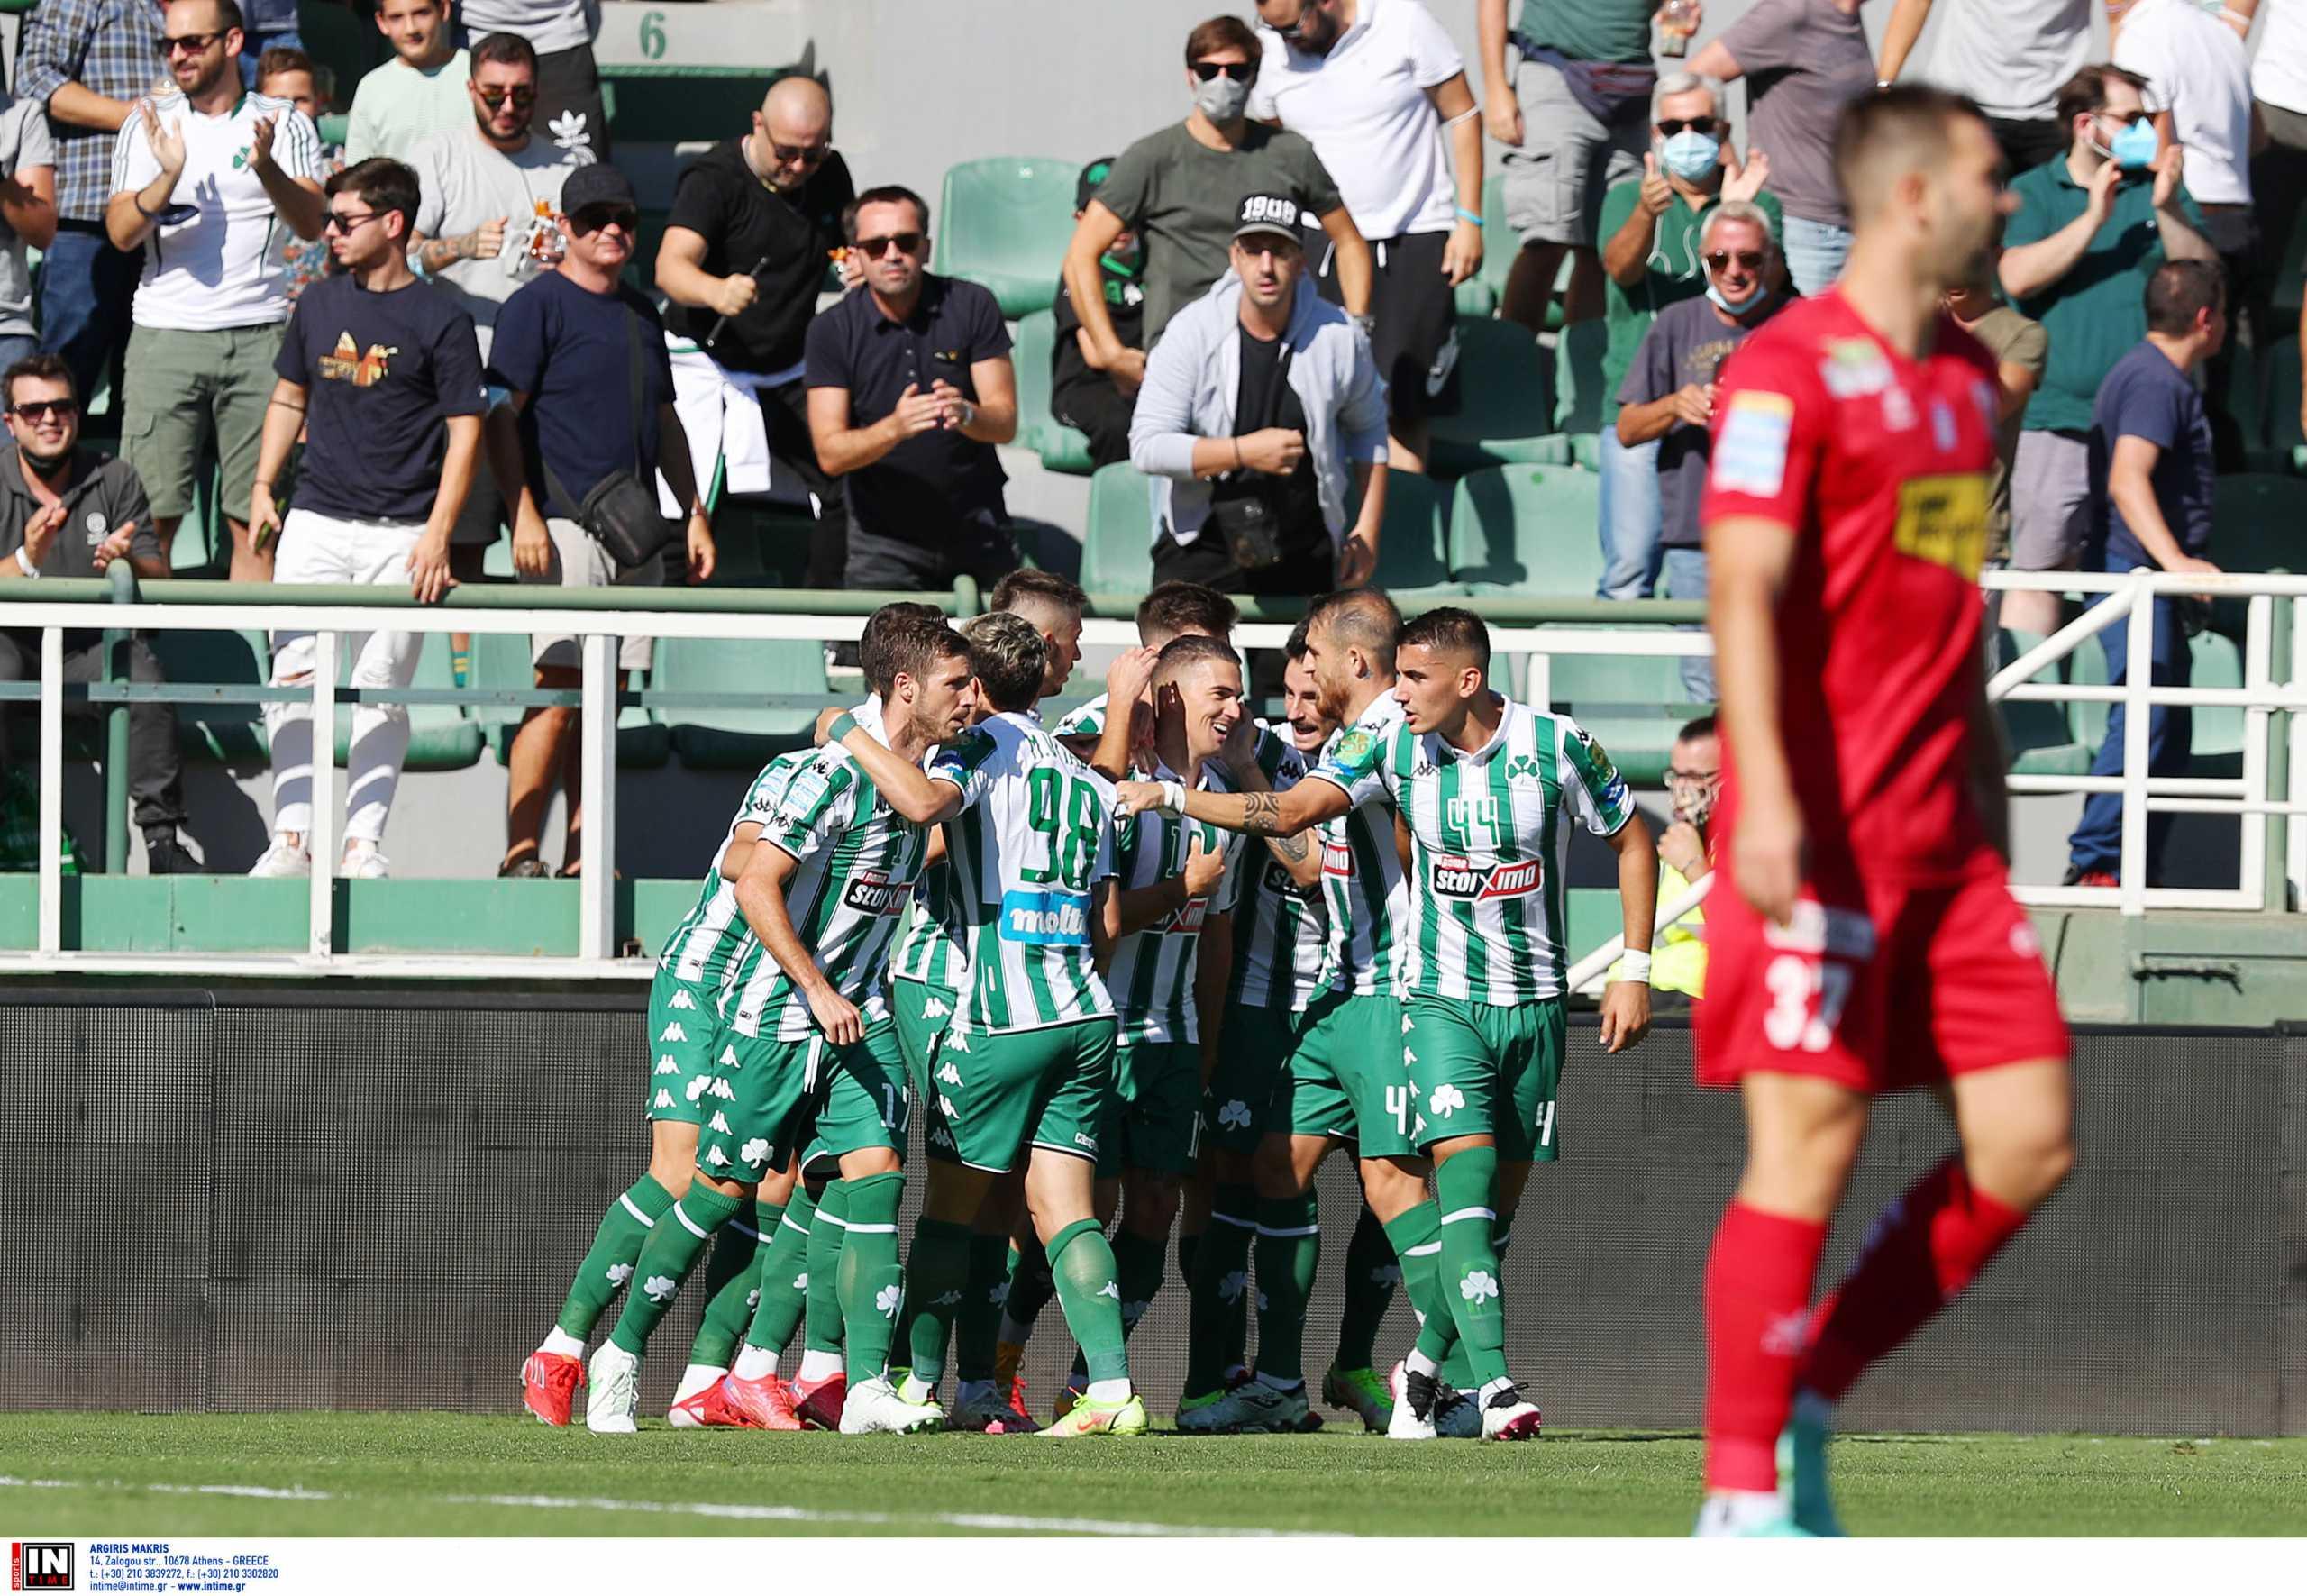 Superleague 1, Παναθηναϊκός – Βόλος 5-1: «Ξέσπασμα» και επιστροφή στις νίκες για το «τριφύλλι»